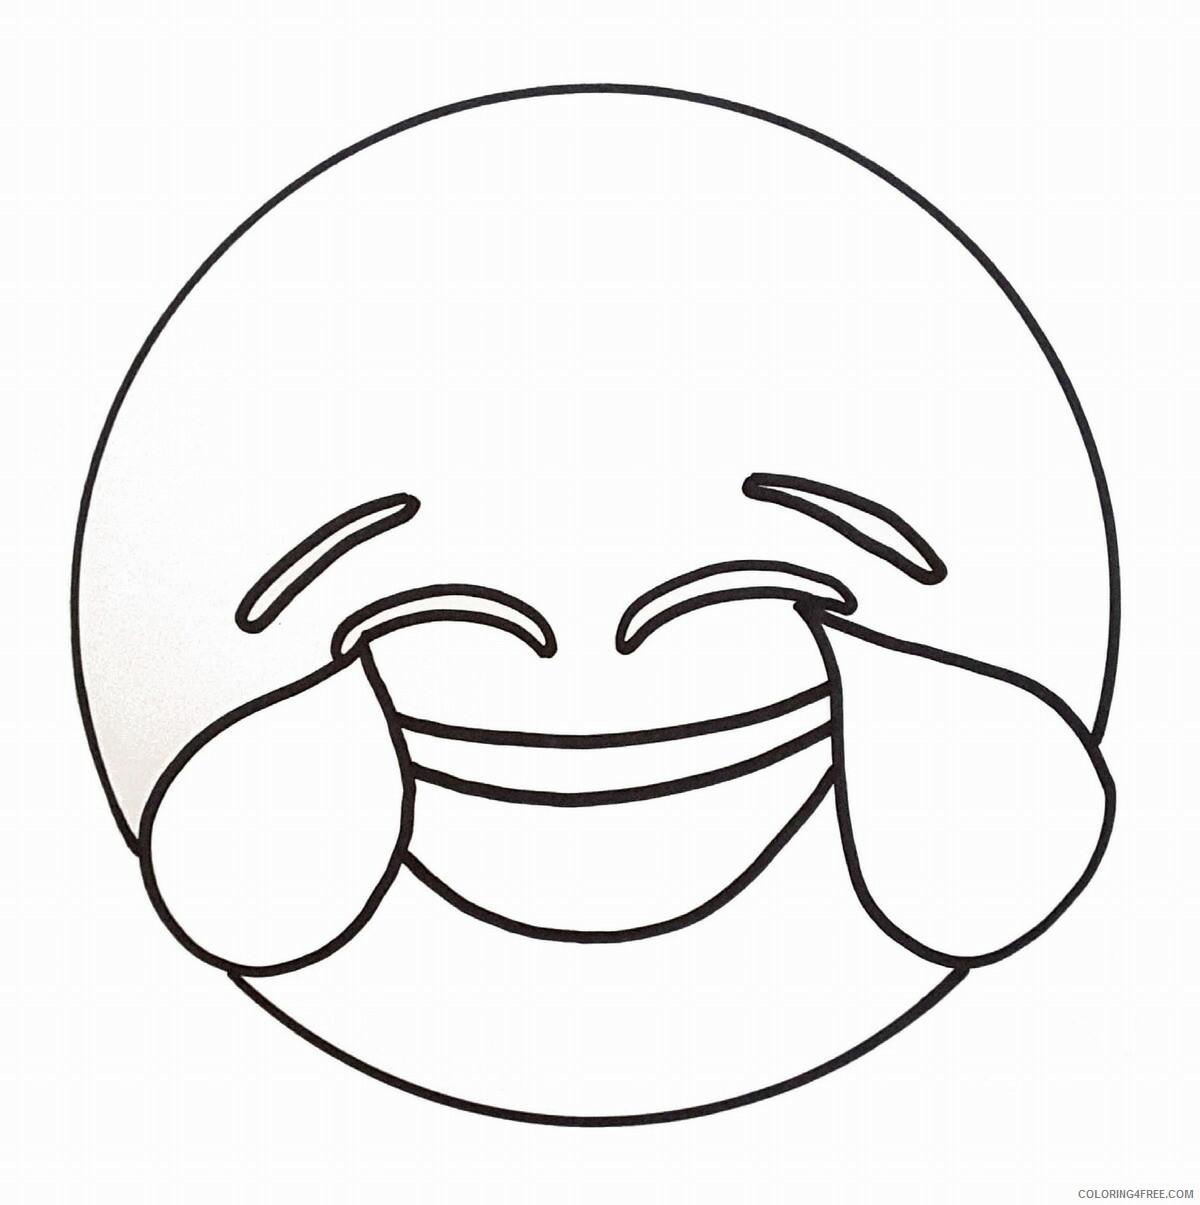 Emoji Coloring Pages emoji17 Printable 2021 2160 Coloring4free